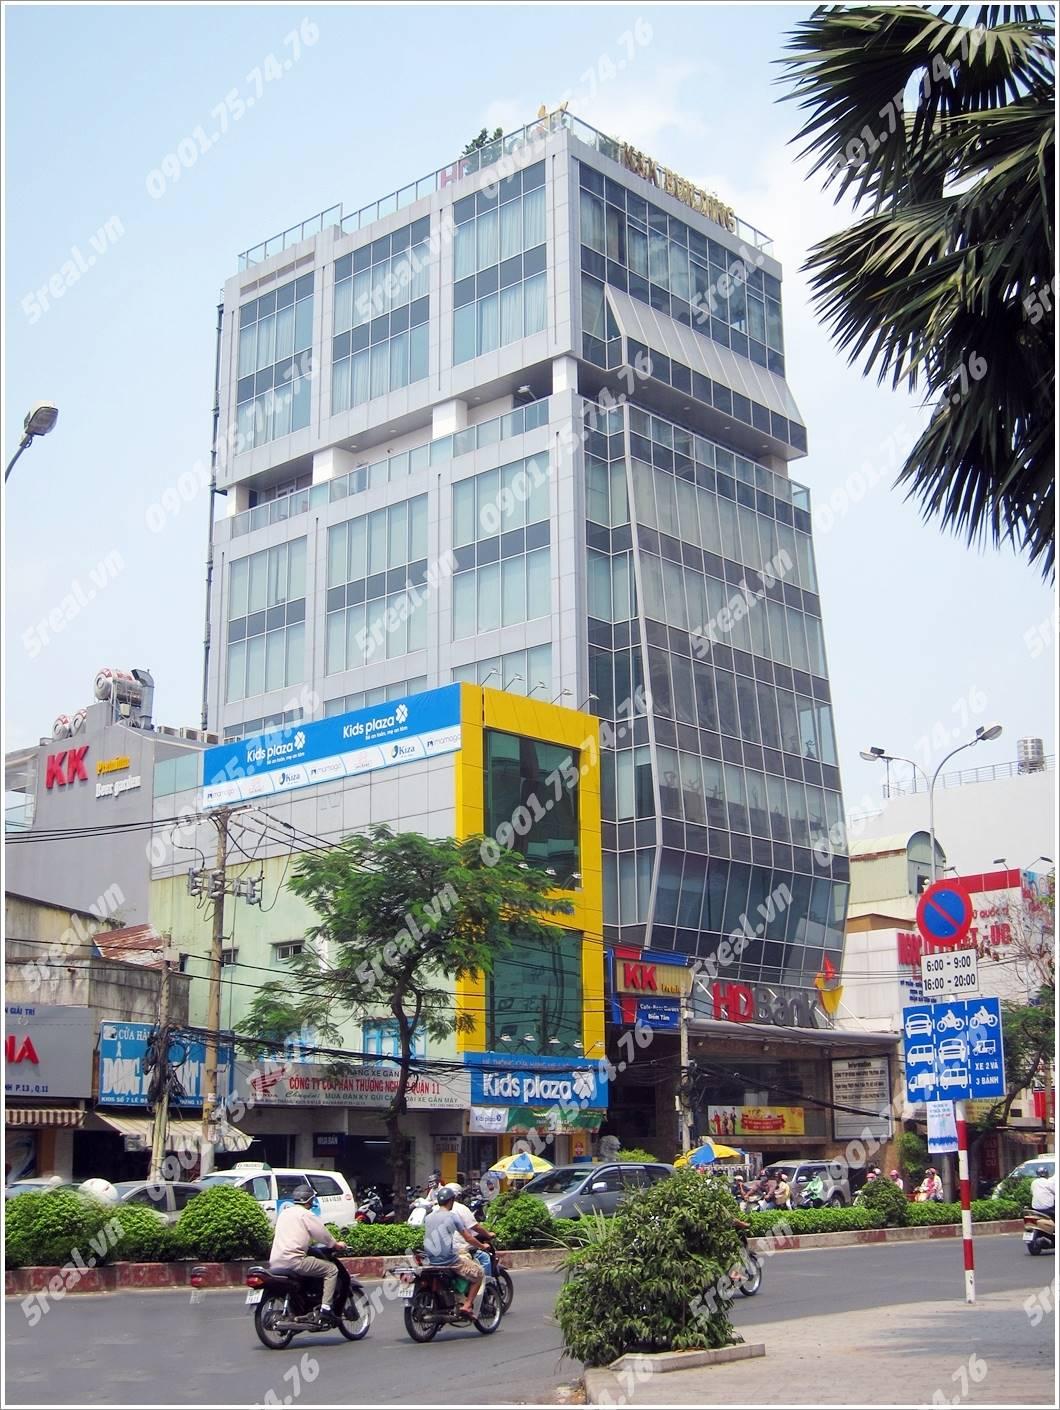 kk-building-le-dai-hanh-quan-11-van-phong-cho-thue-tphcm-5real.vn-02